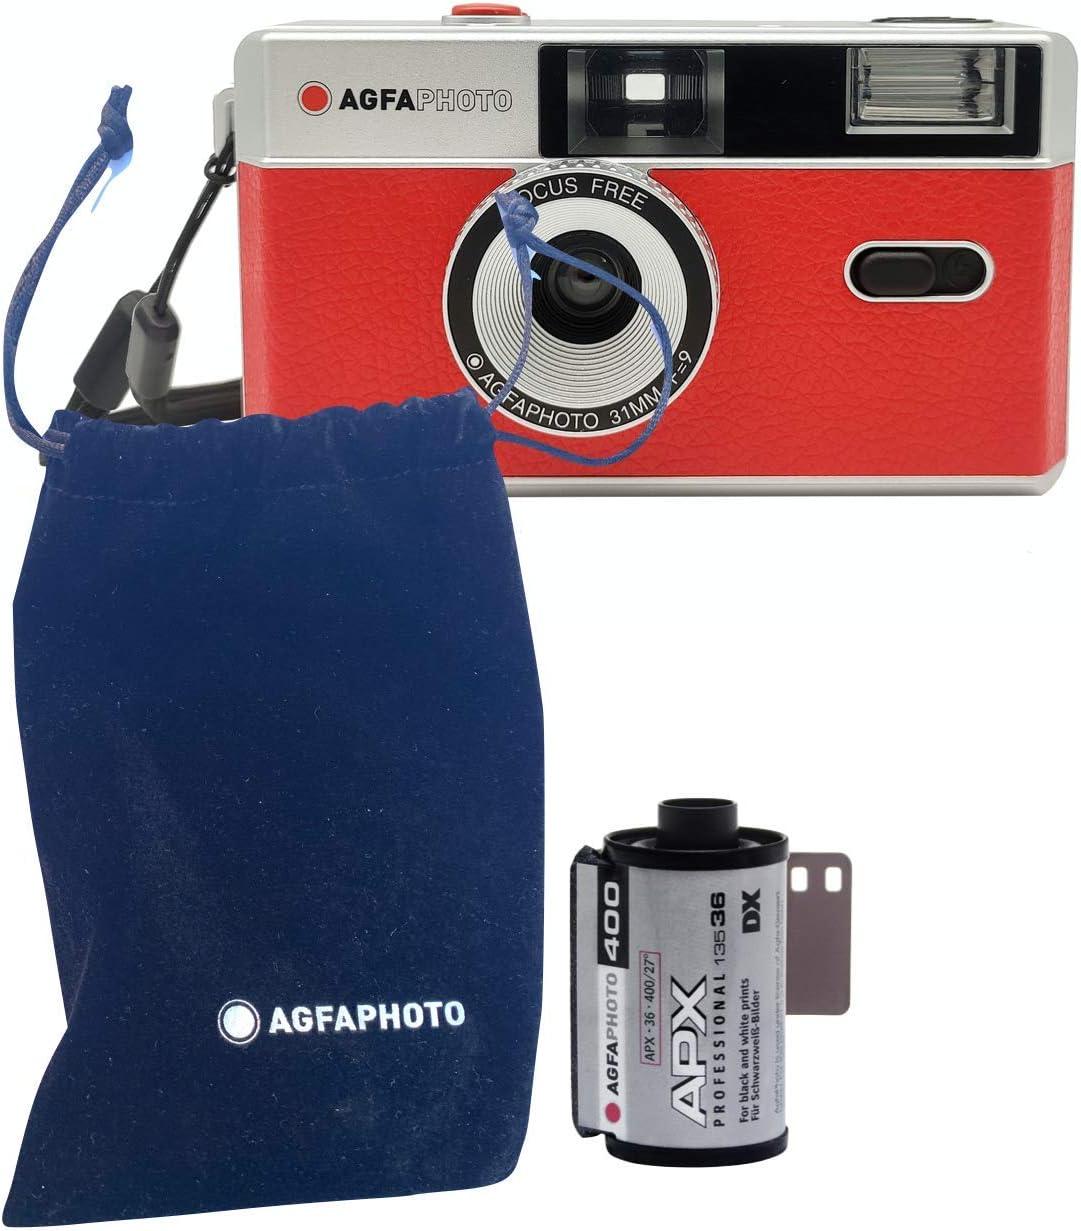 Agfaphoto 35mm Analoge Fotokamera Black Kamera